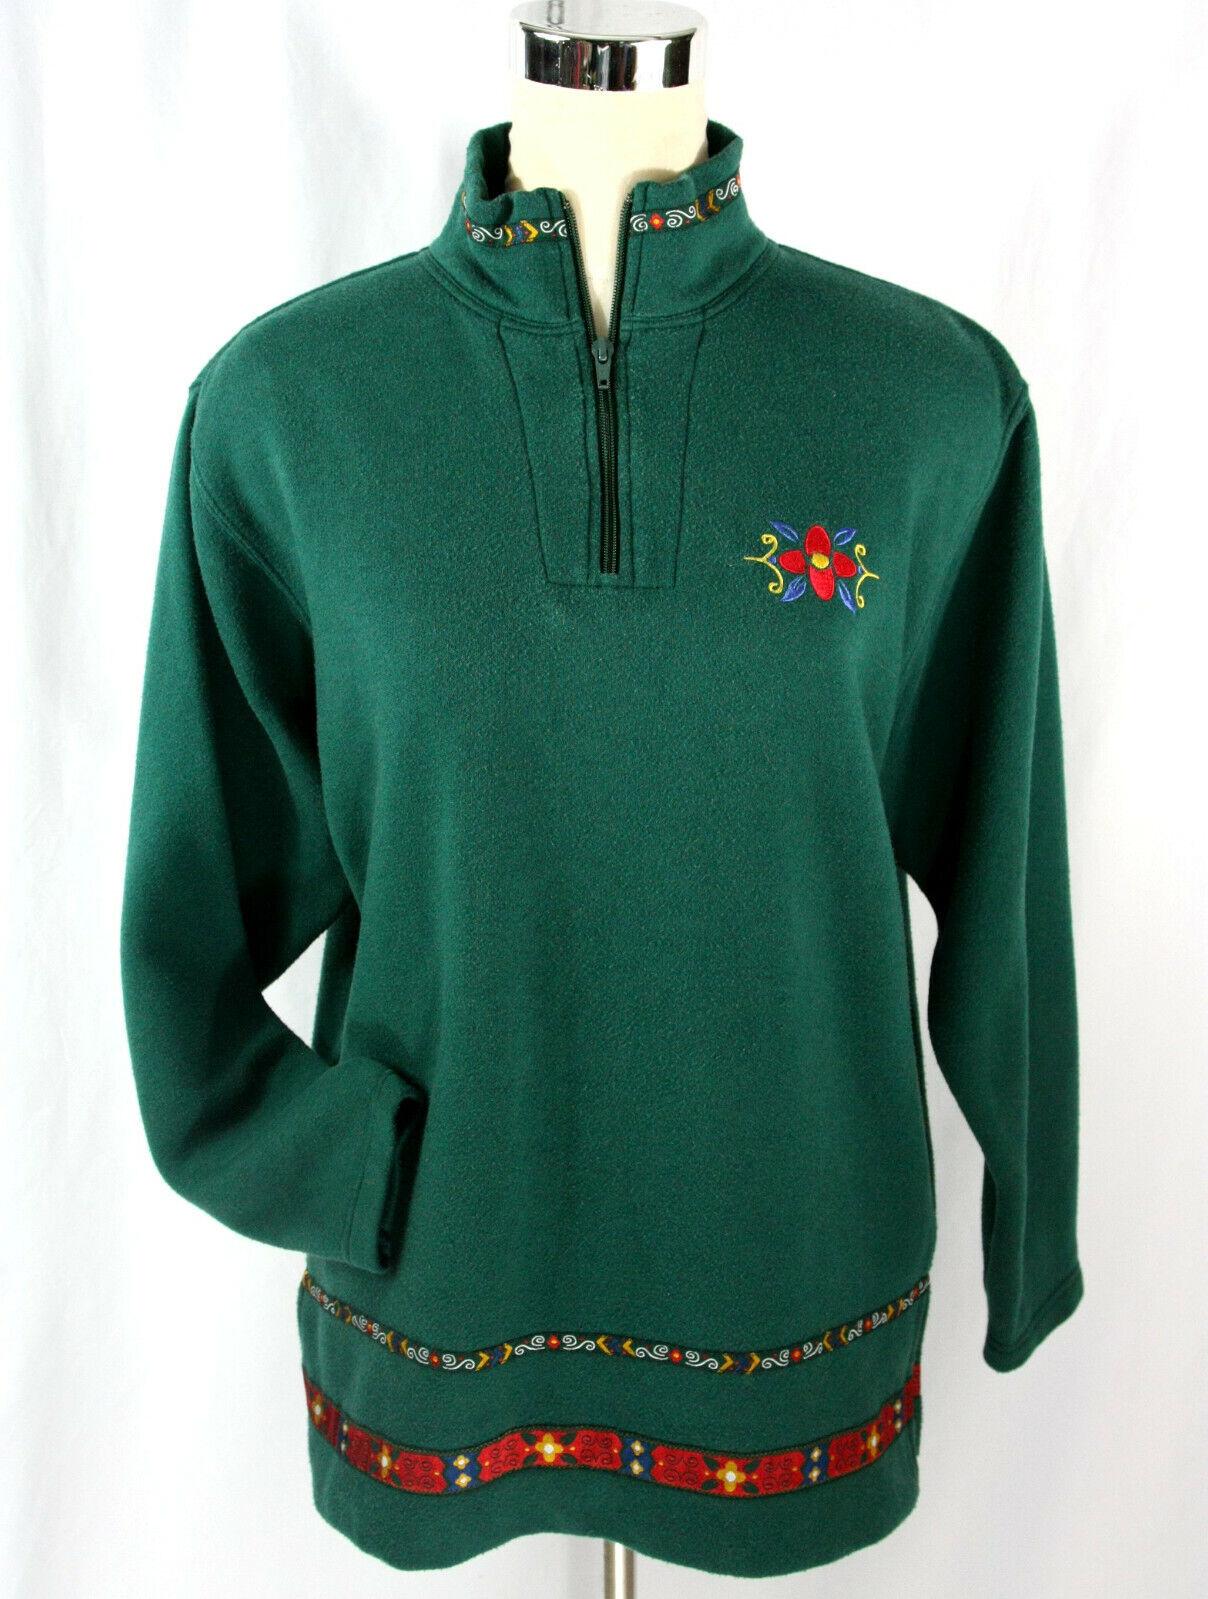 Vintage American Sportif High Neck Peasant Fleece Pullover Tunic - S 6-8 - Green